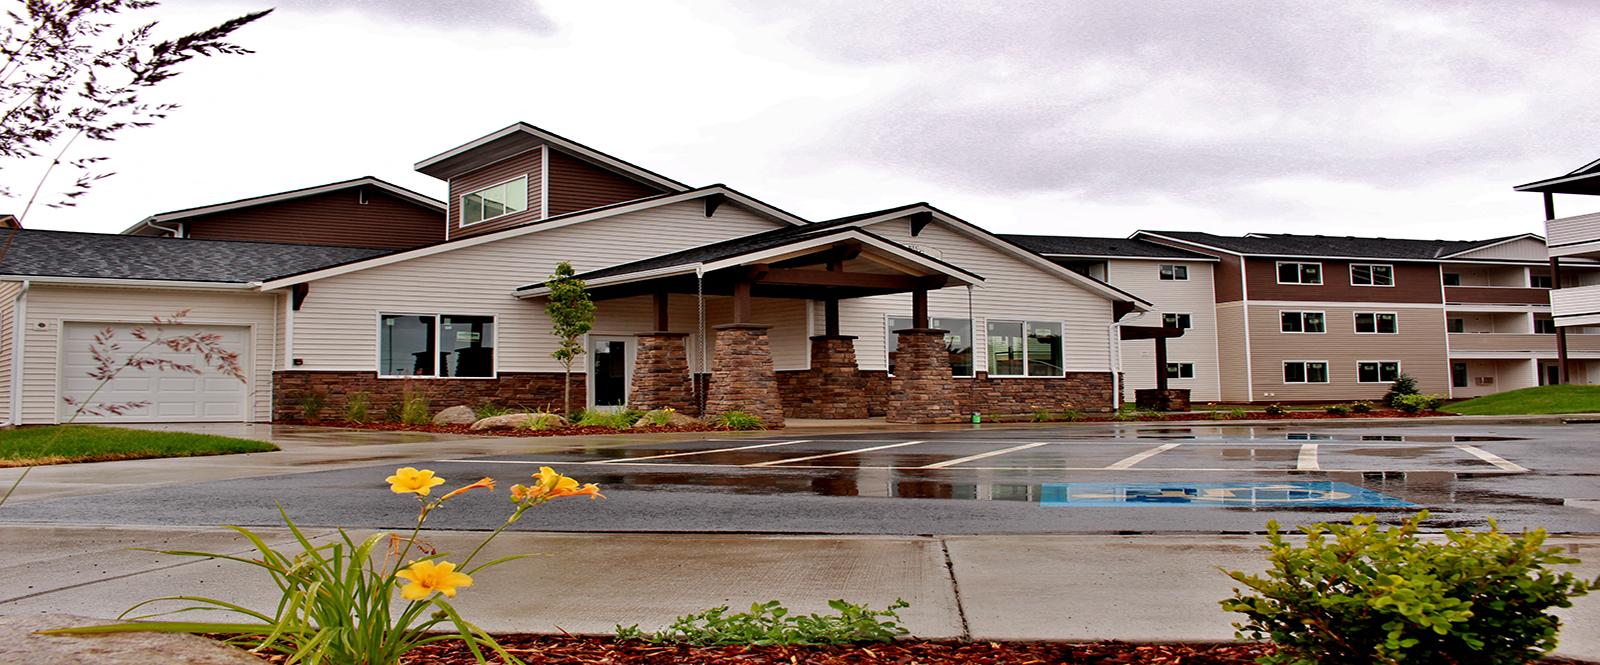 Spokane Valley photogallery 3